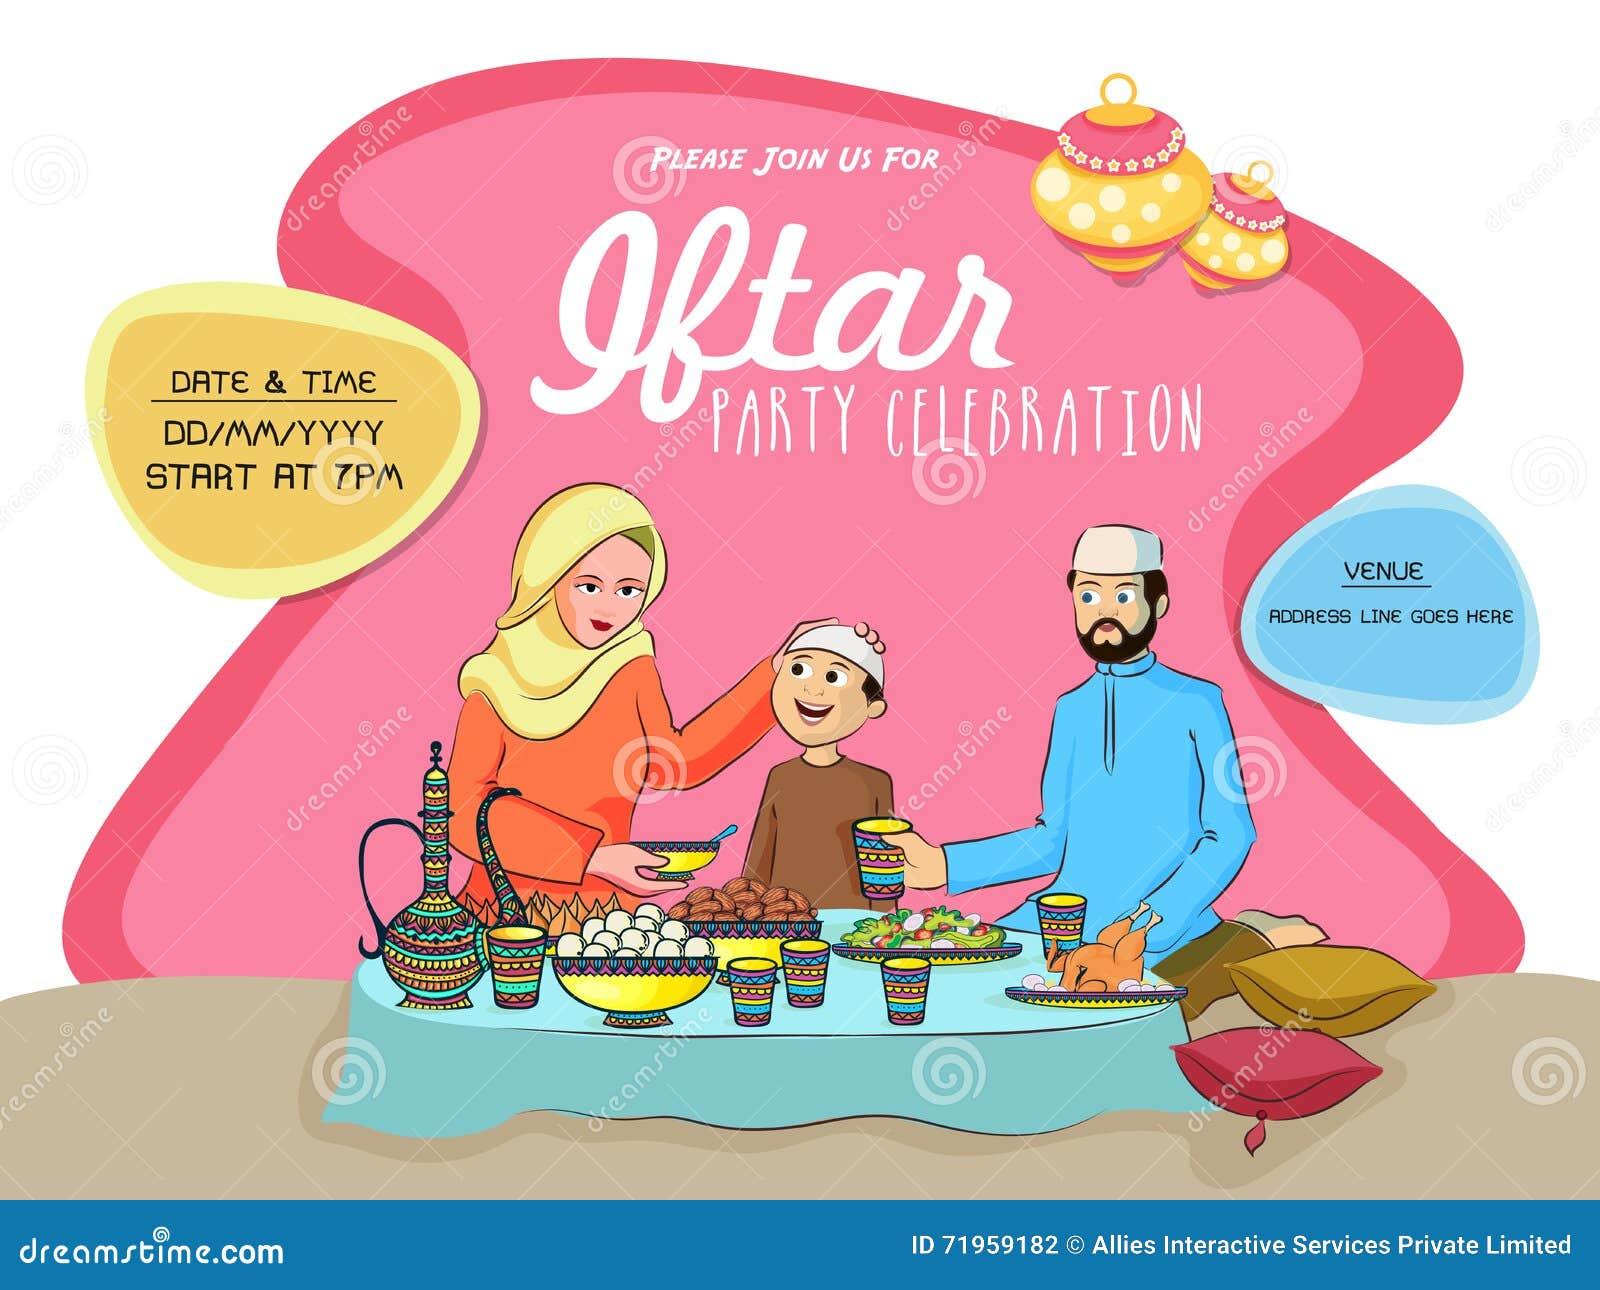 Iftar Party Invitation Card Design Stock Illustration